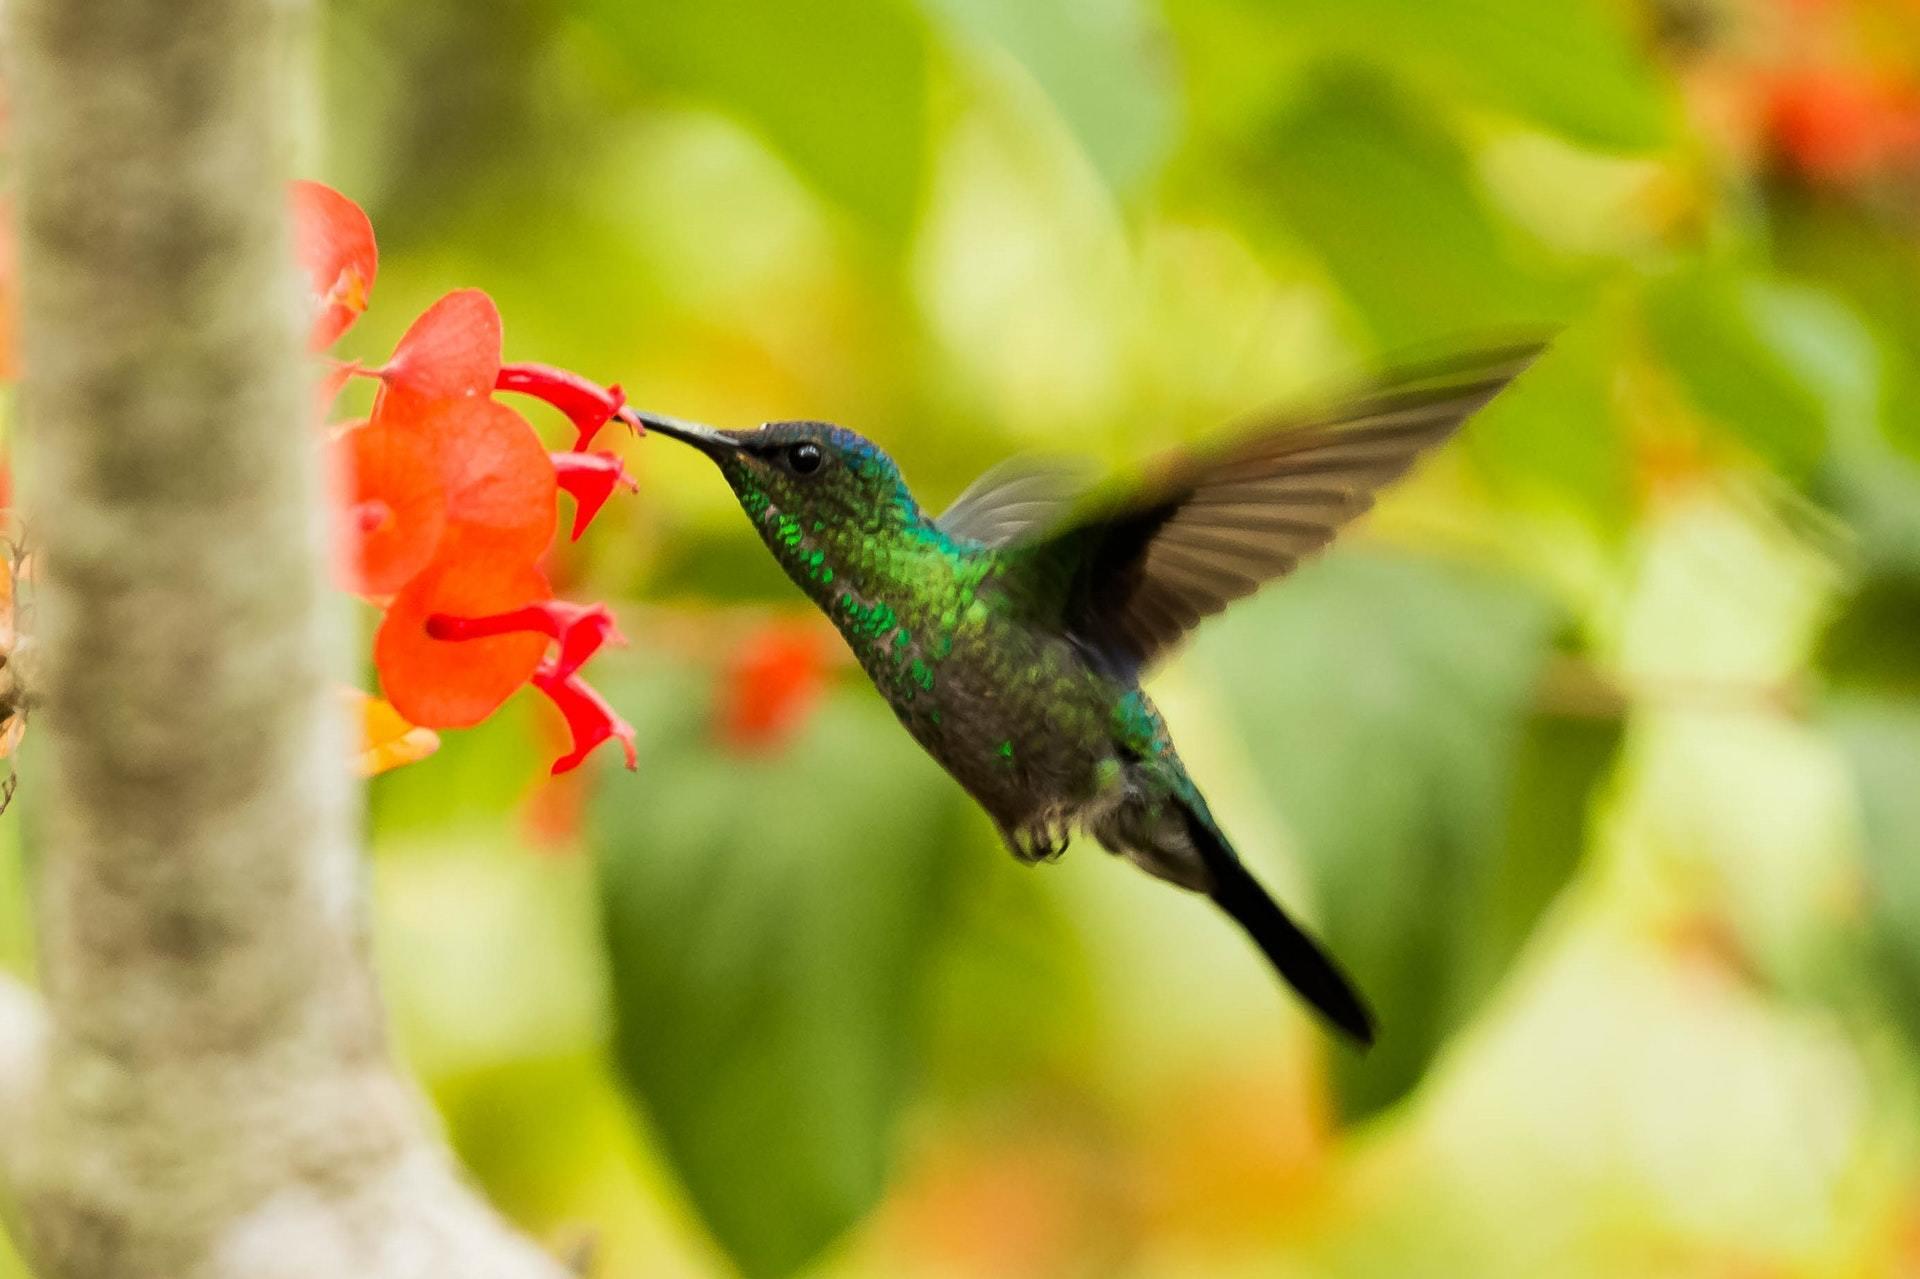 Hummingbird in flight with red flower.